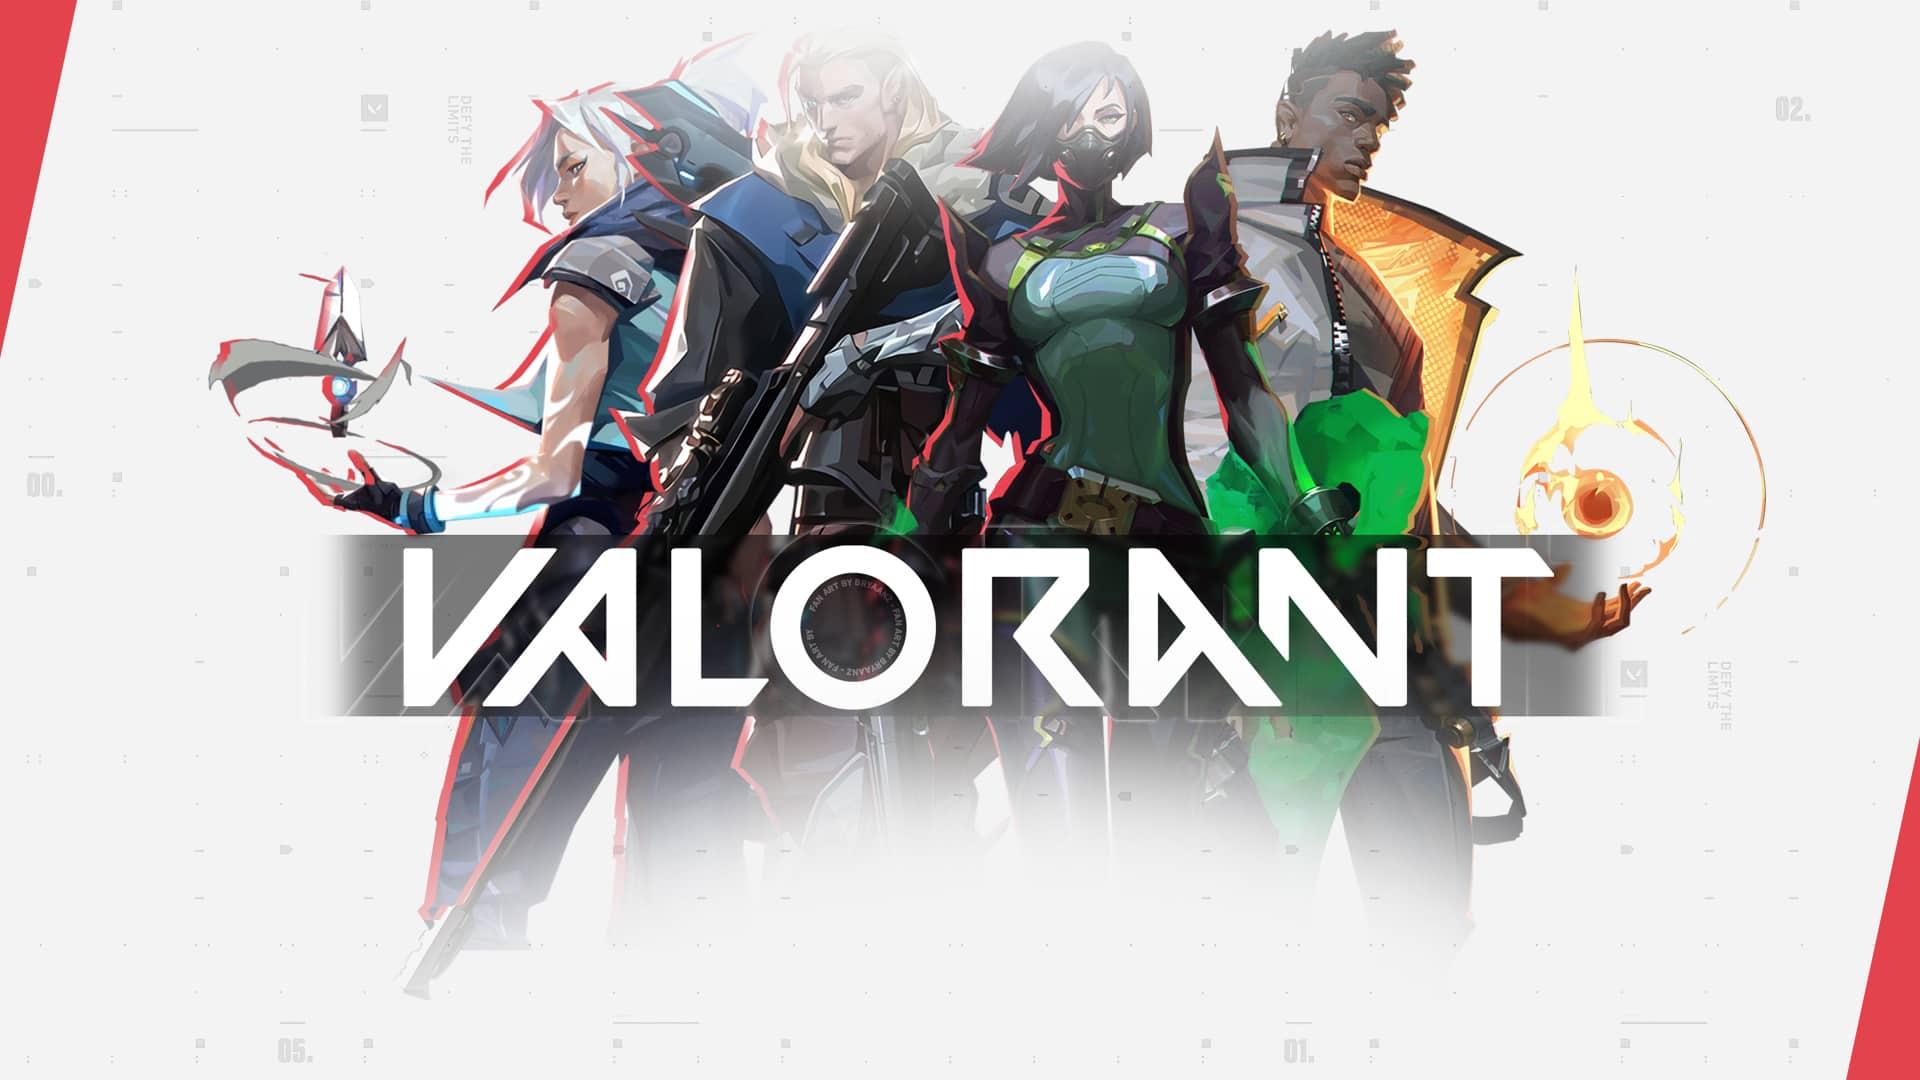 Shadowplay Fortnite Random Fps Drop Valorant Players Report Massive Fps Drop After New Update Riot Responds Talkesport